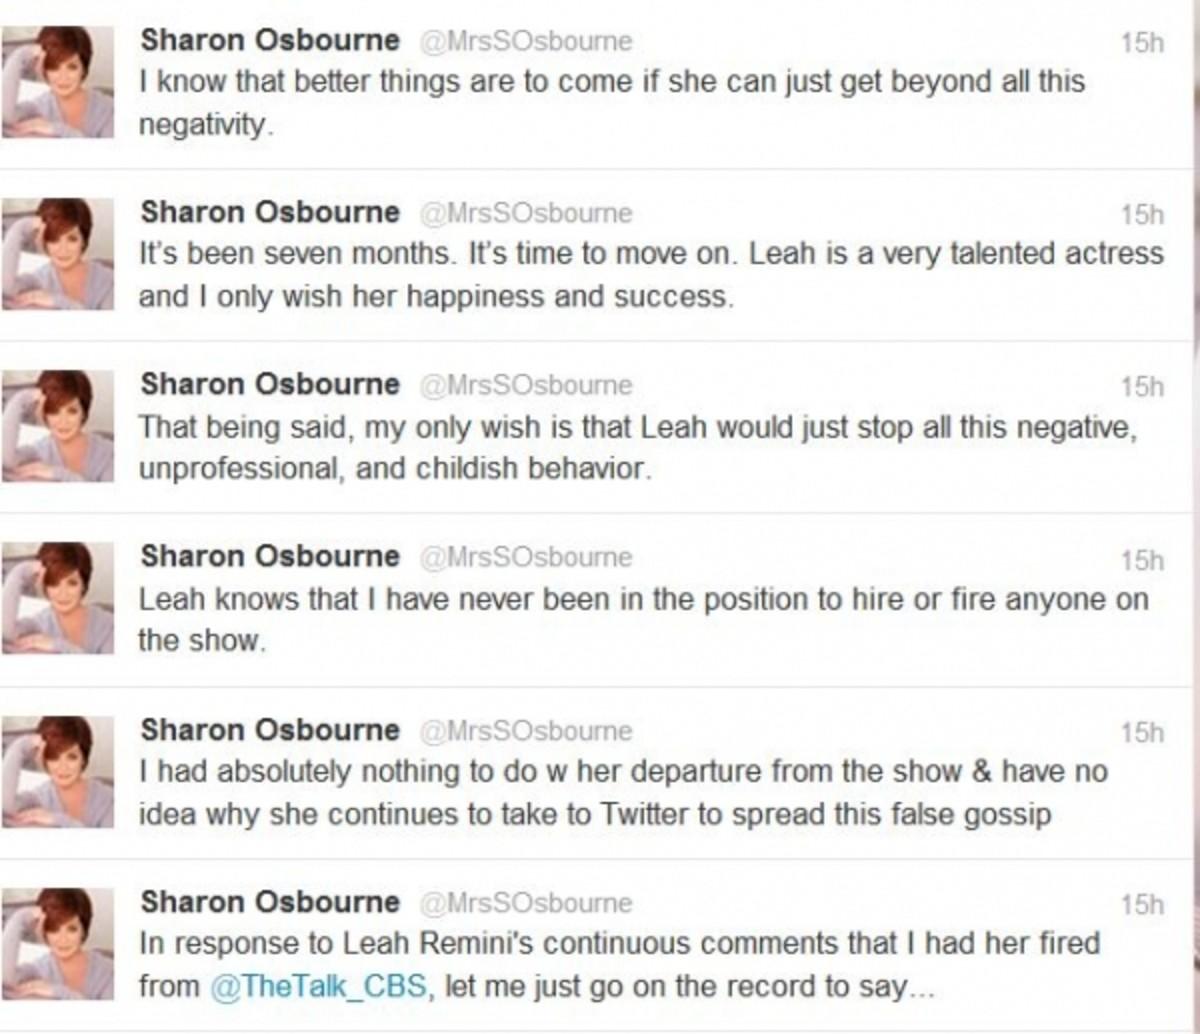 Sharon_Osbourne